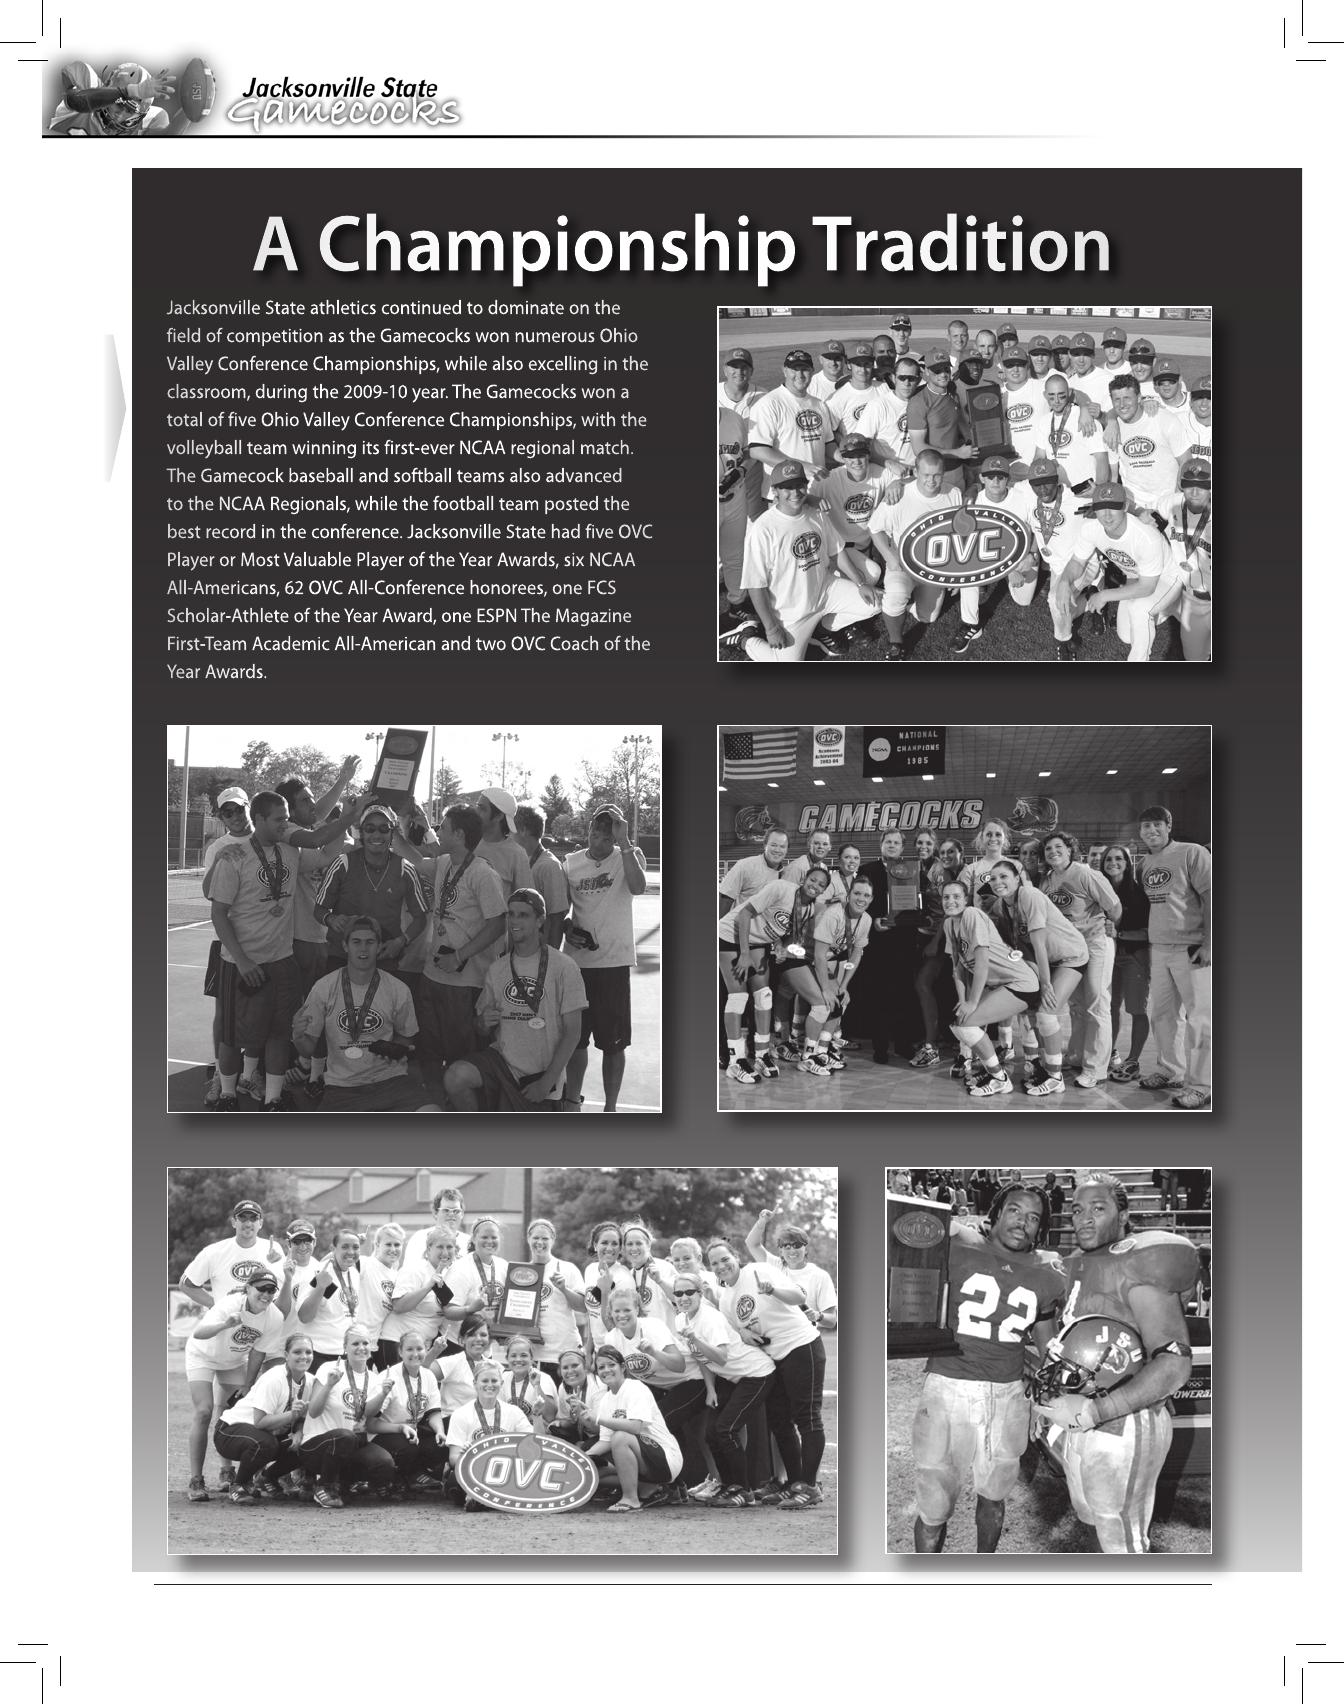 2010 Jacksonville State Football Media Guide - [Pdf Document]  Julian Code 17:511999